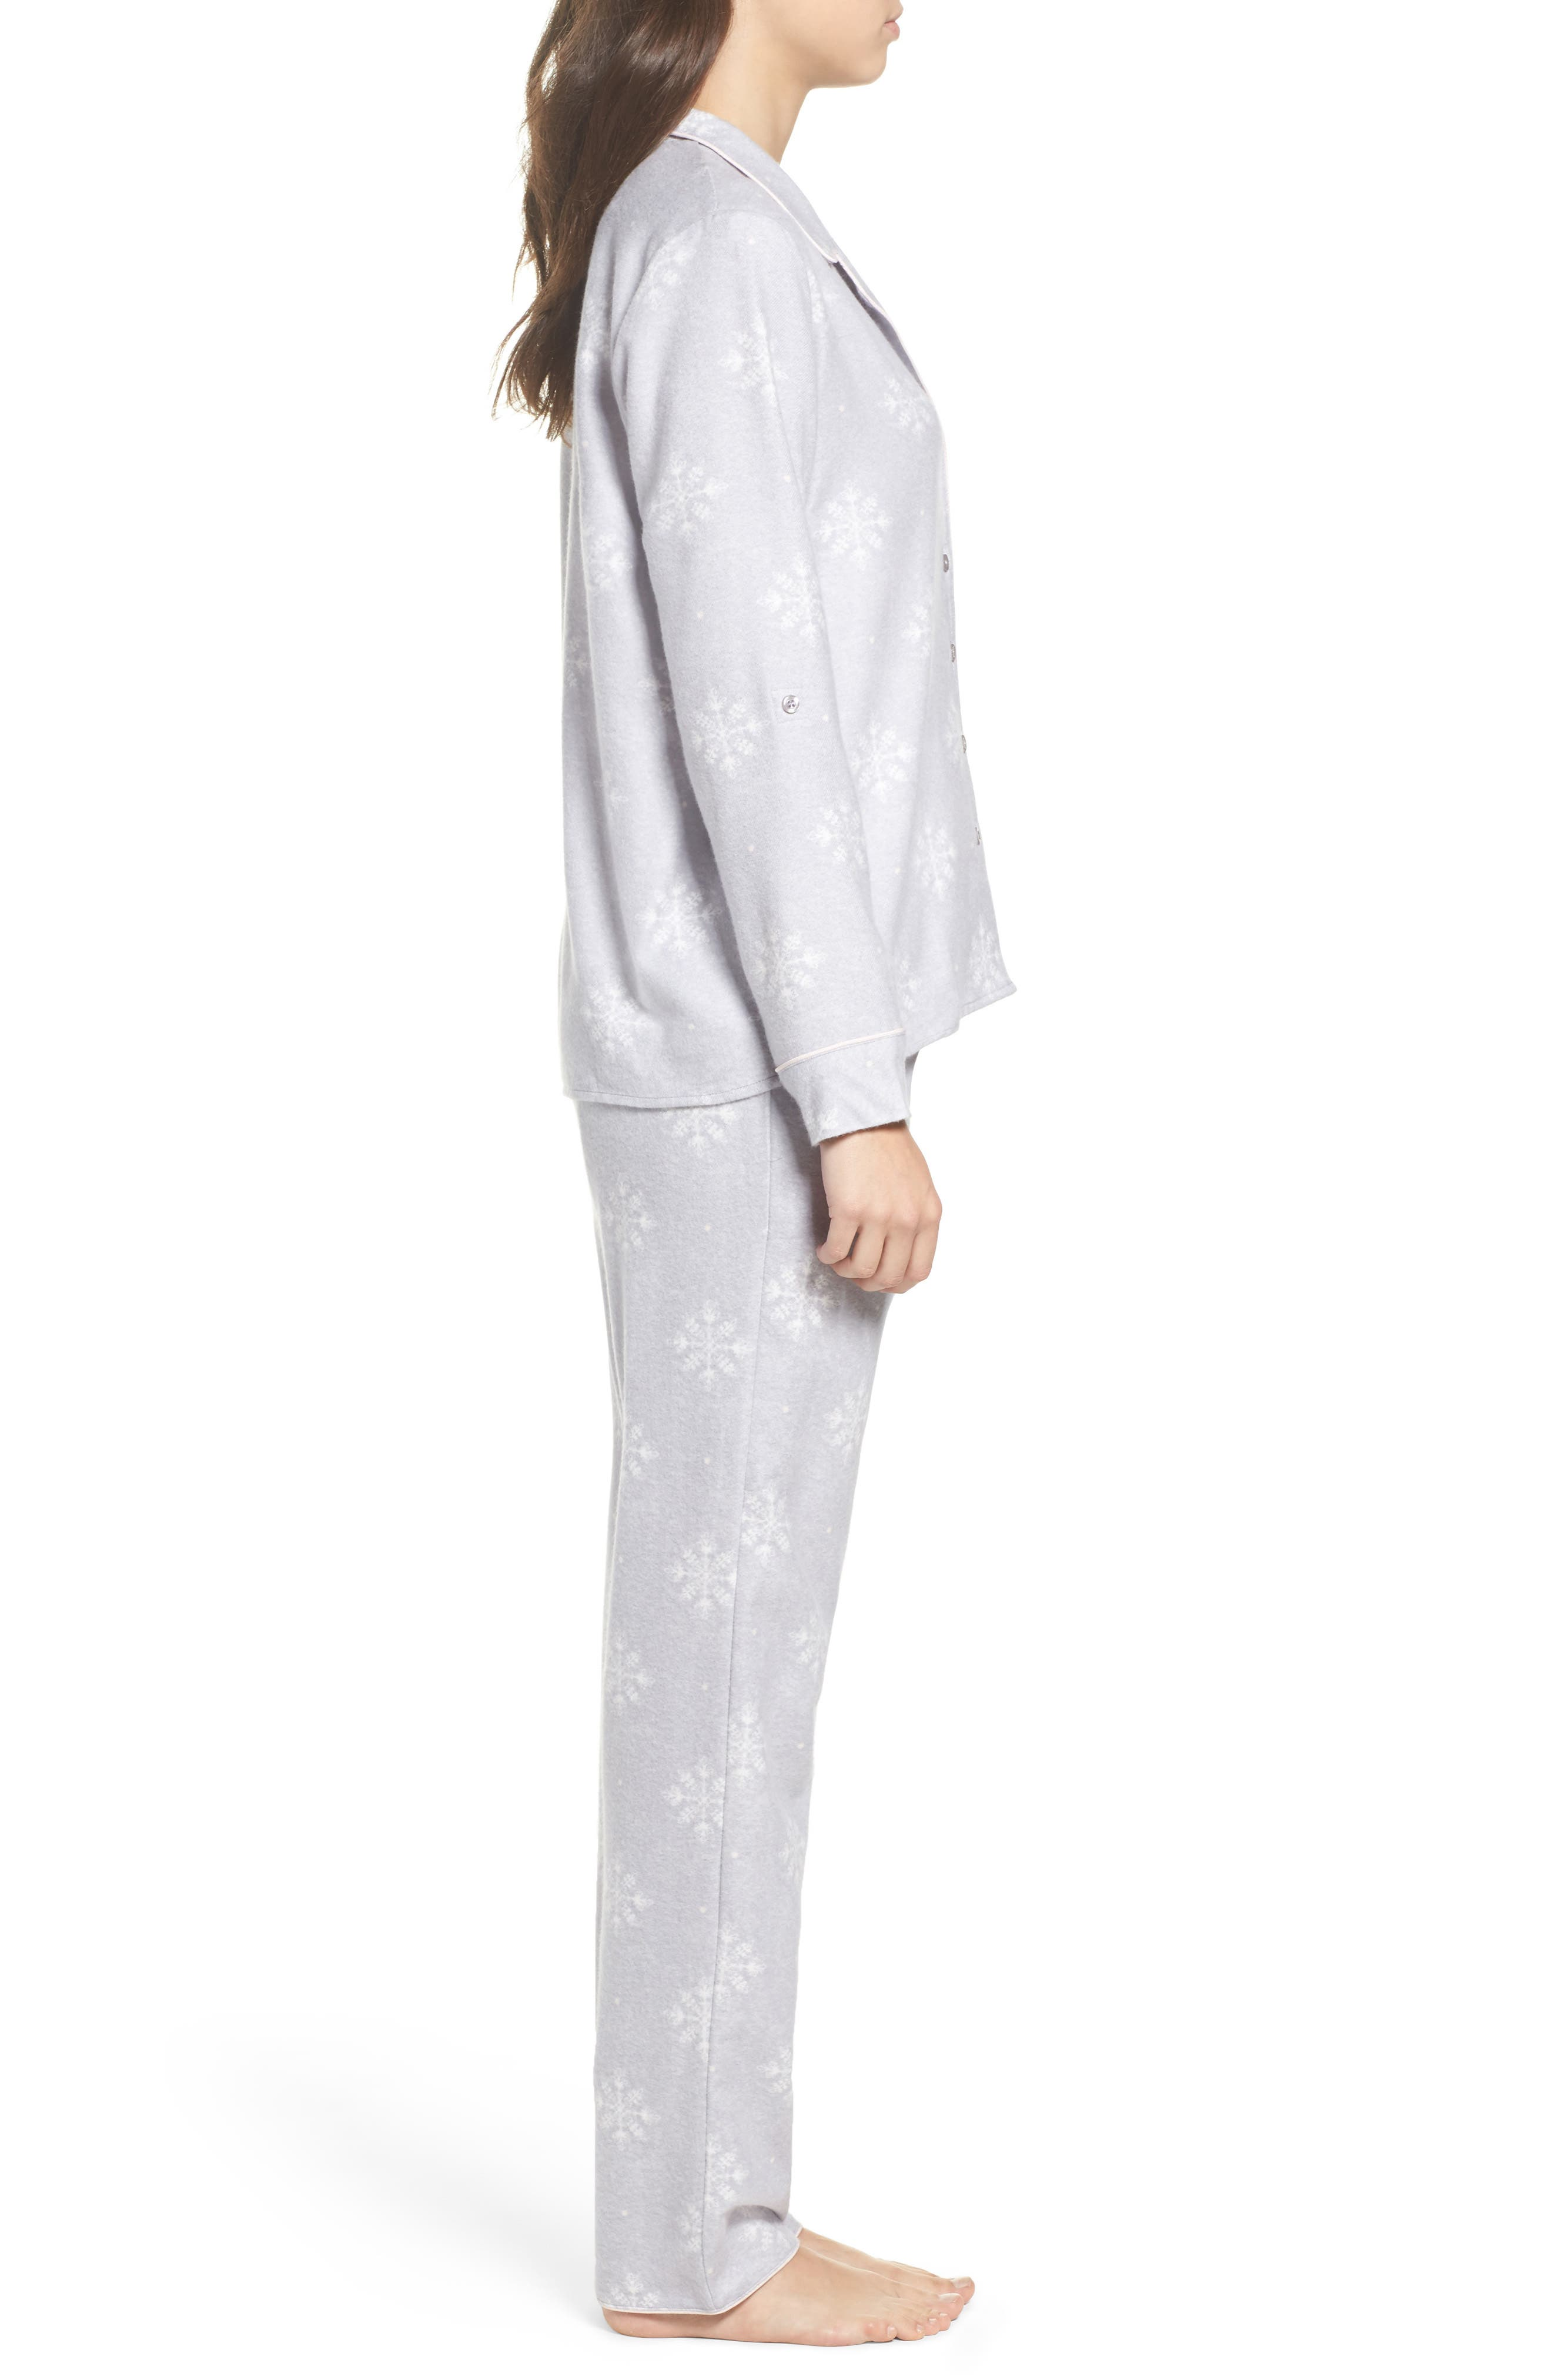 Lingerie Starlight Flannel Pajamas,                             Alternate thumbnail 11, color,